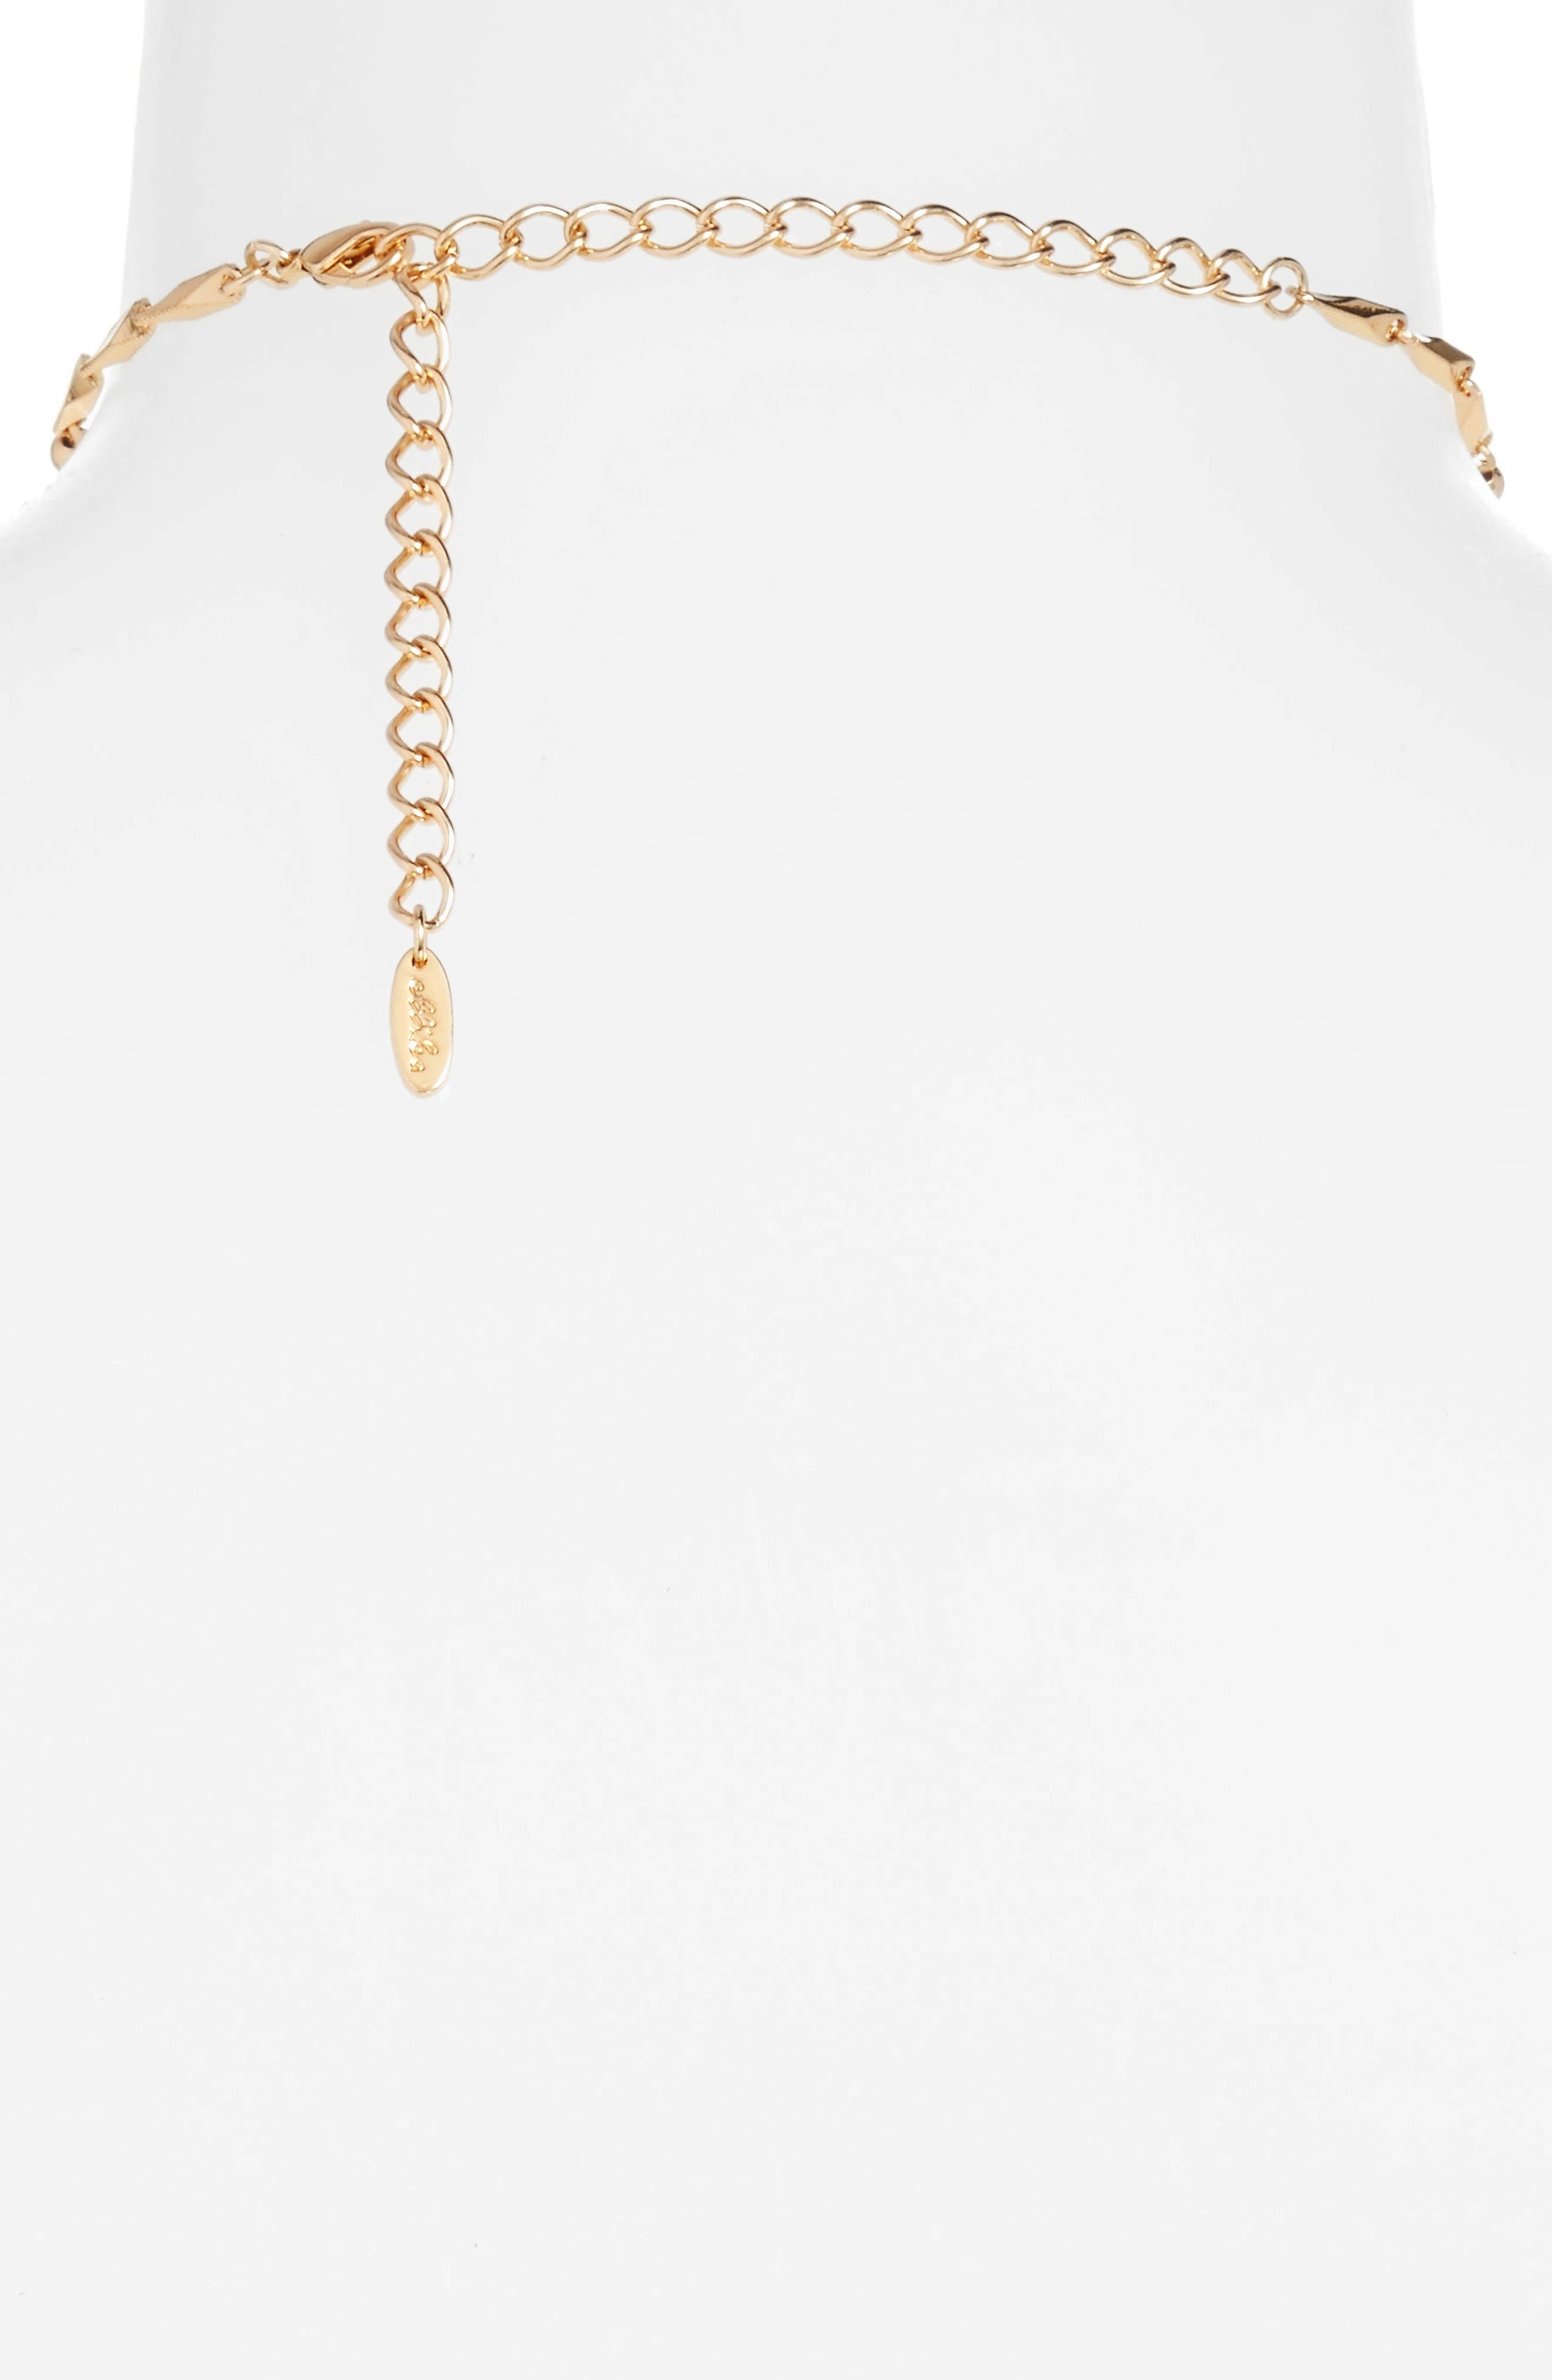 Lariat Necklace,                             Alternate thumbnail 2, color,                             Gold